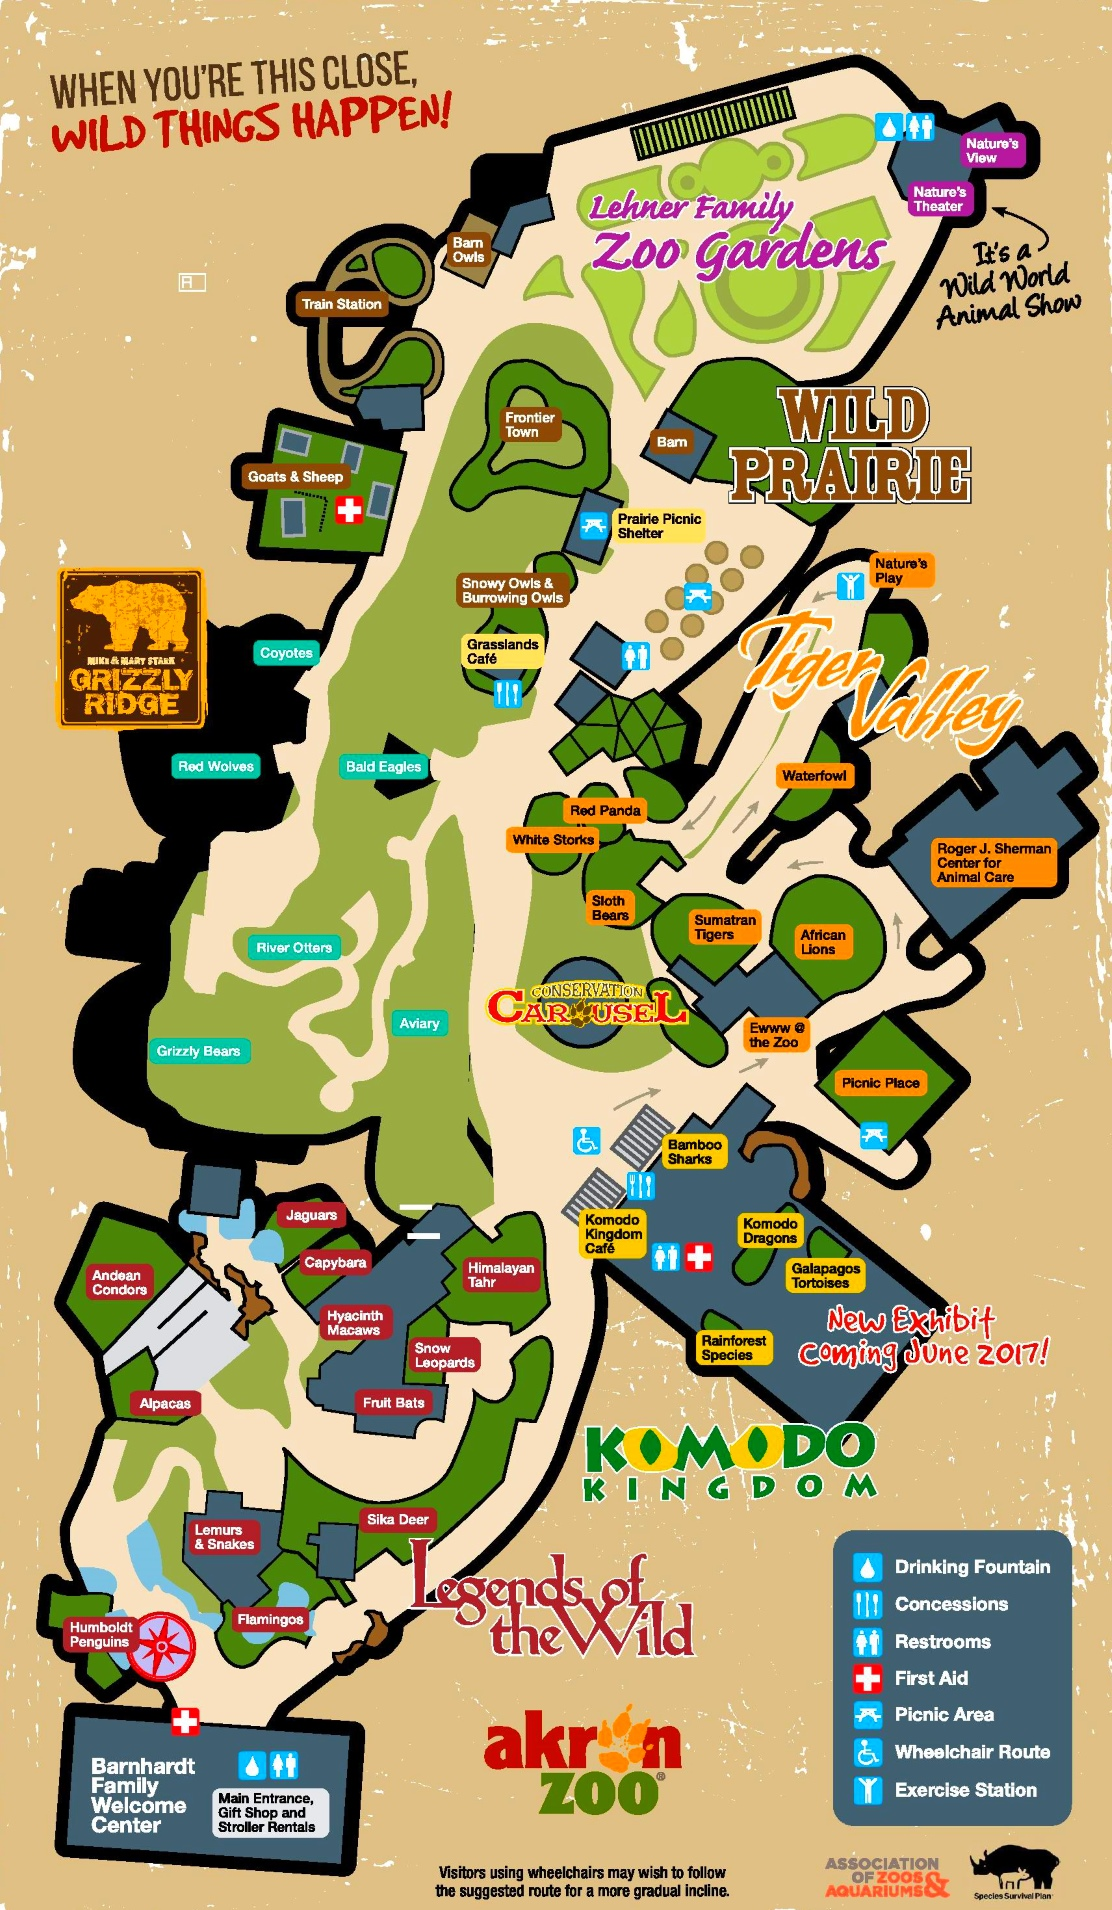 Akron Zoo map